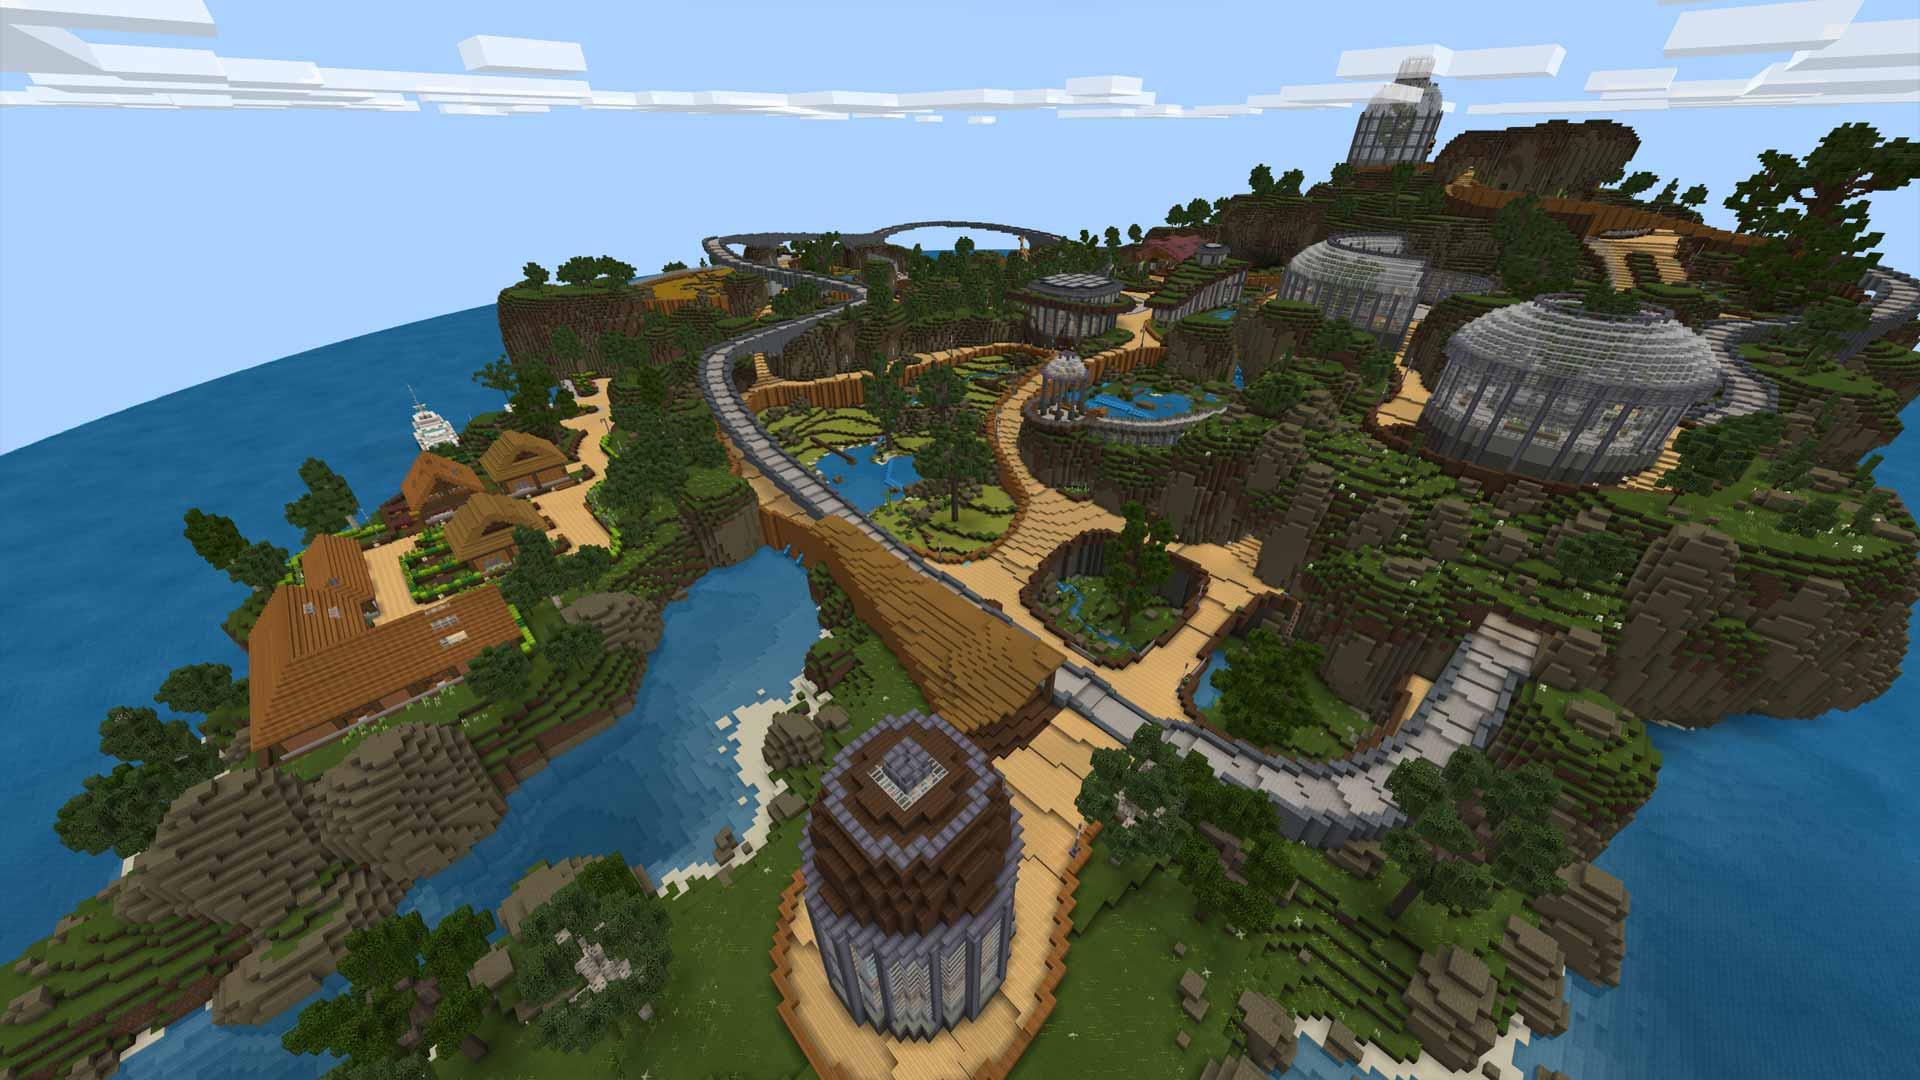 Minecraft Mine Zoo Review - Gamerheadquarters